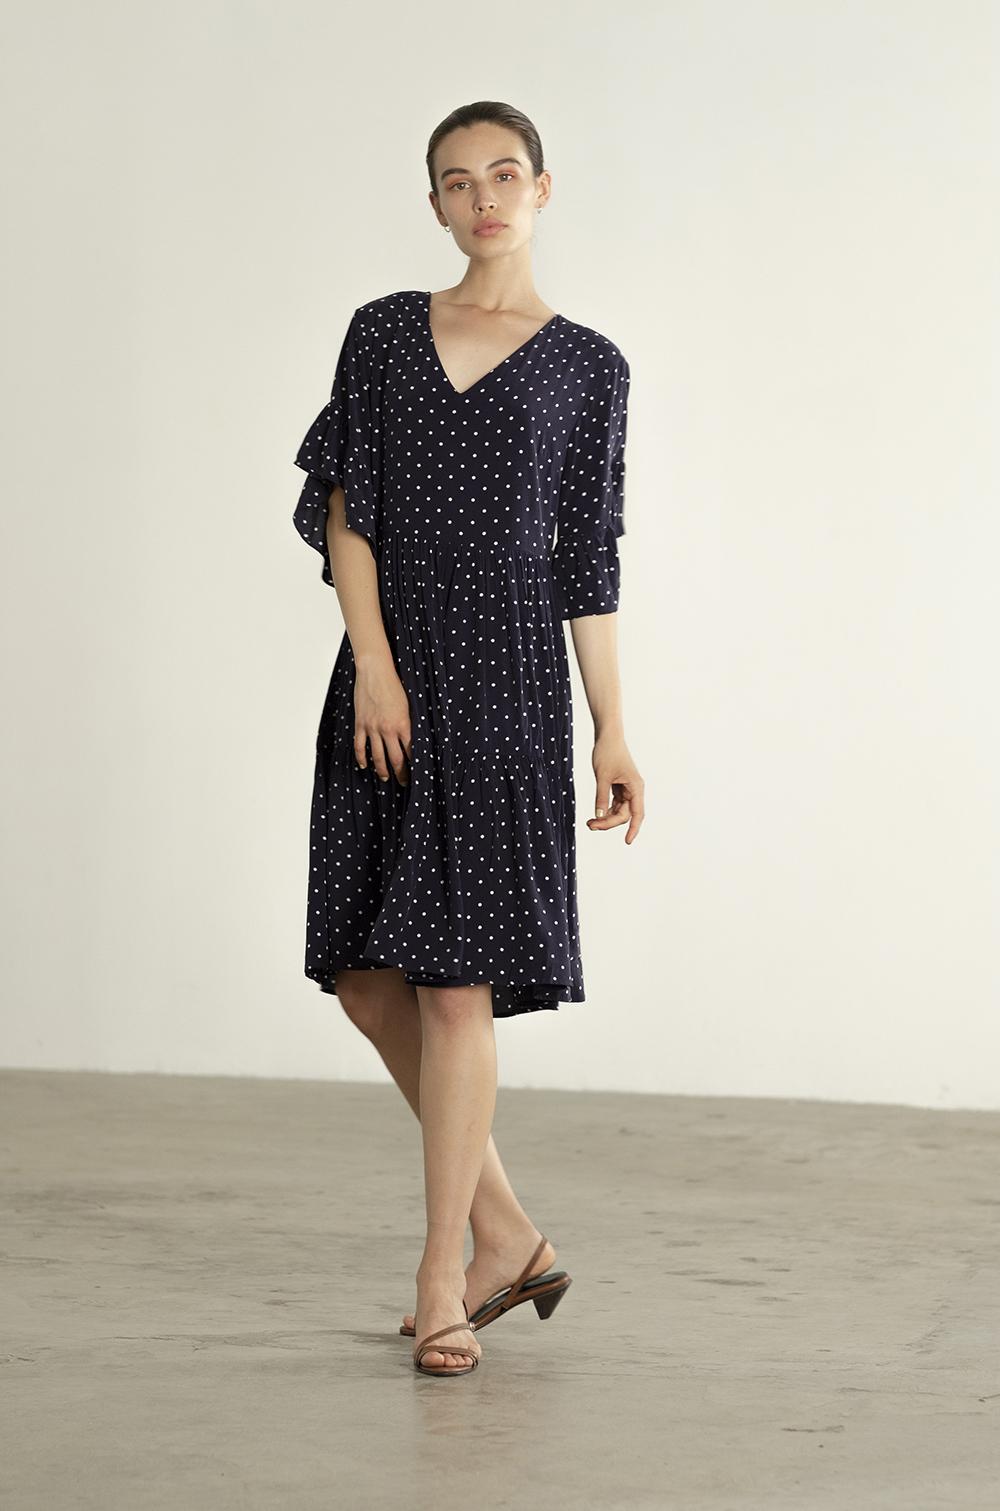 Maria Stanley Spring 2019 Gayle dress cupro navy polka dot 01